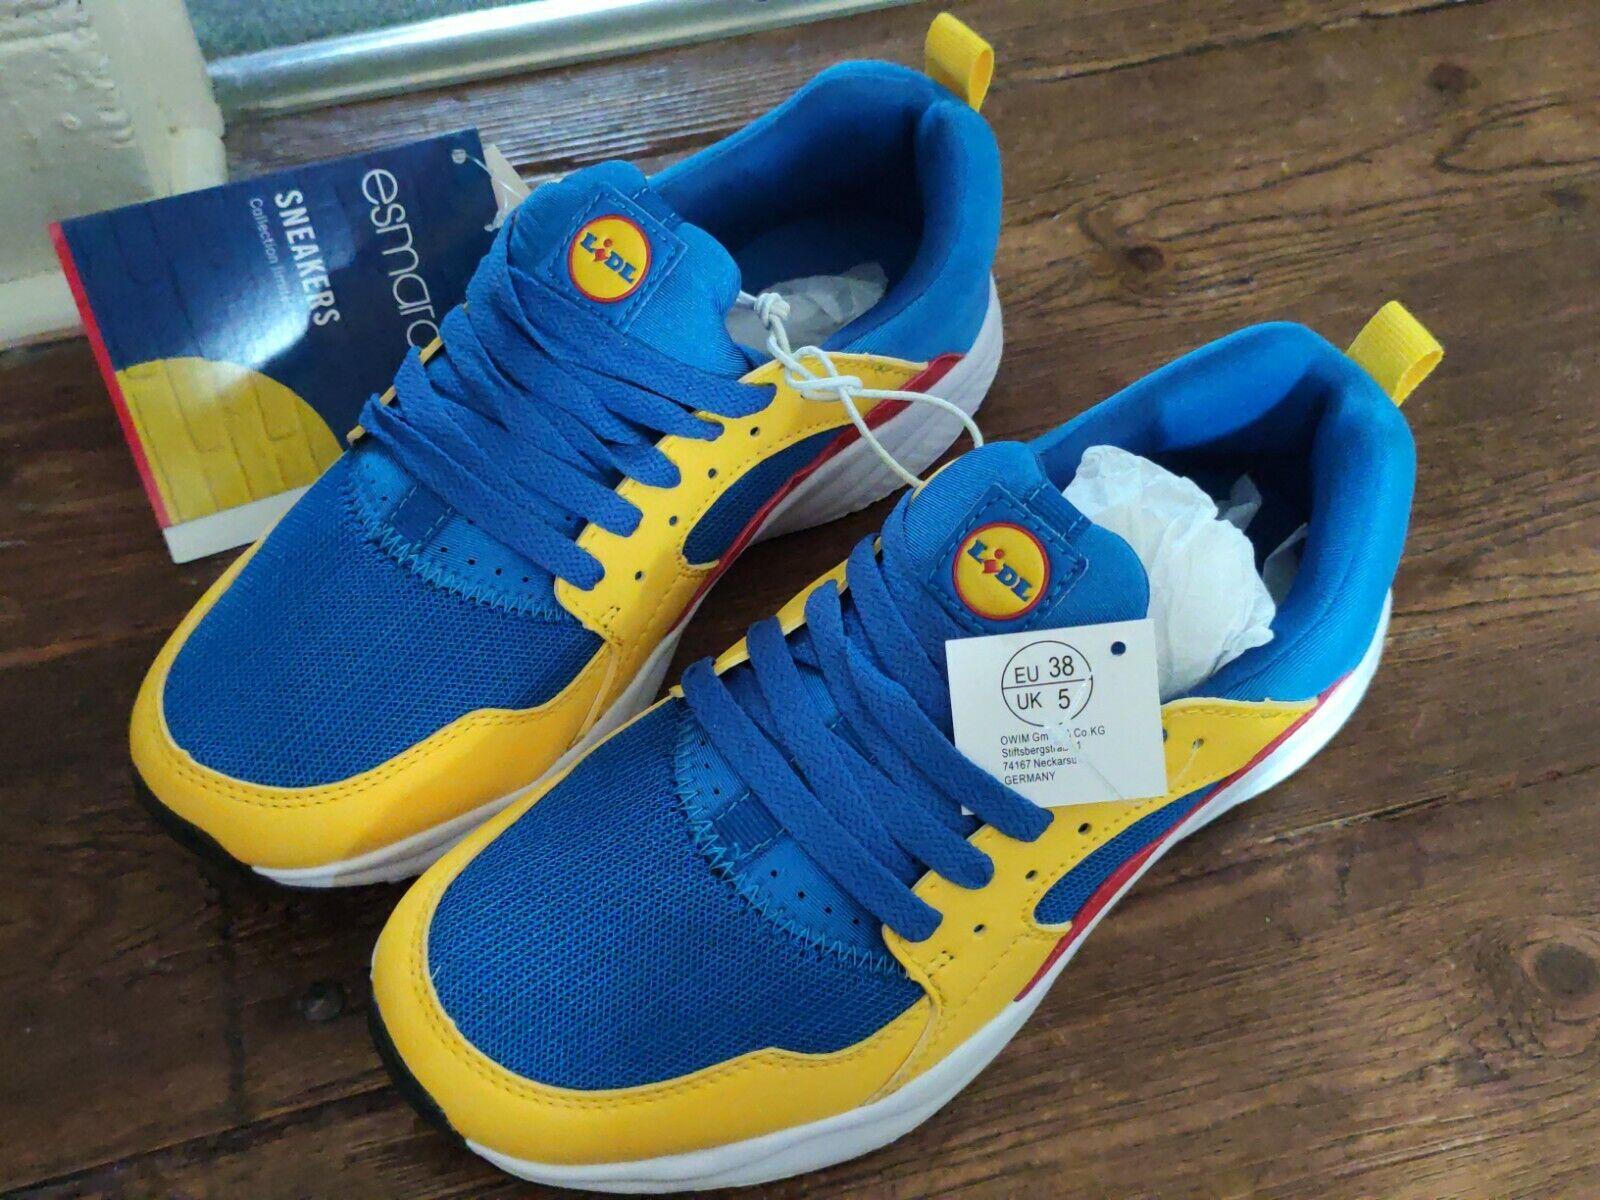 chaussures lidl collector, édition limitée, sneaker, 38 EU, UK 5